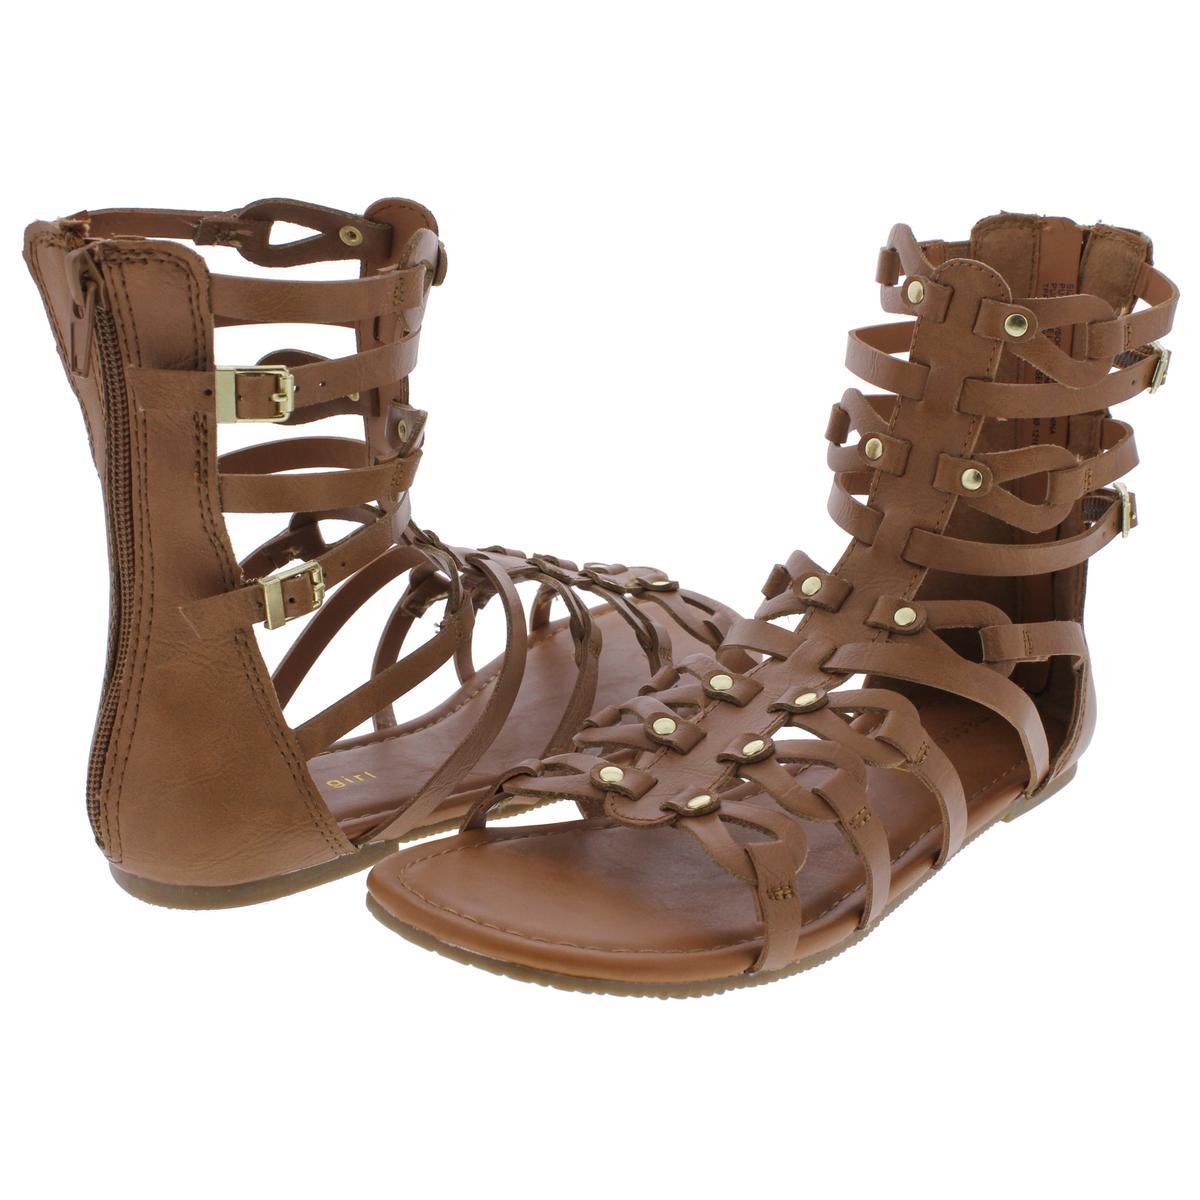 6595d3dbde77 Details about Madden Girl by Steve Madden Girls SERENTE Flat Gladiator  Sandals Flats BHFO 0226